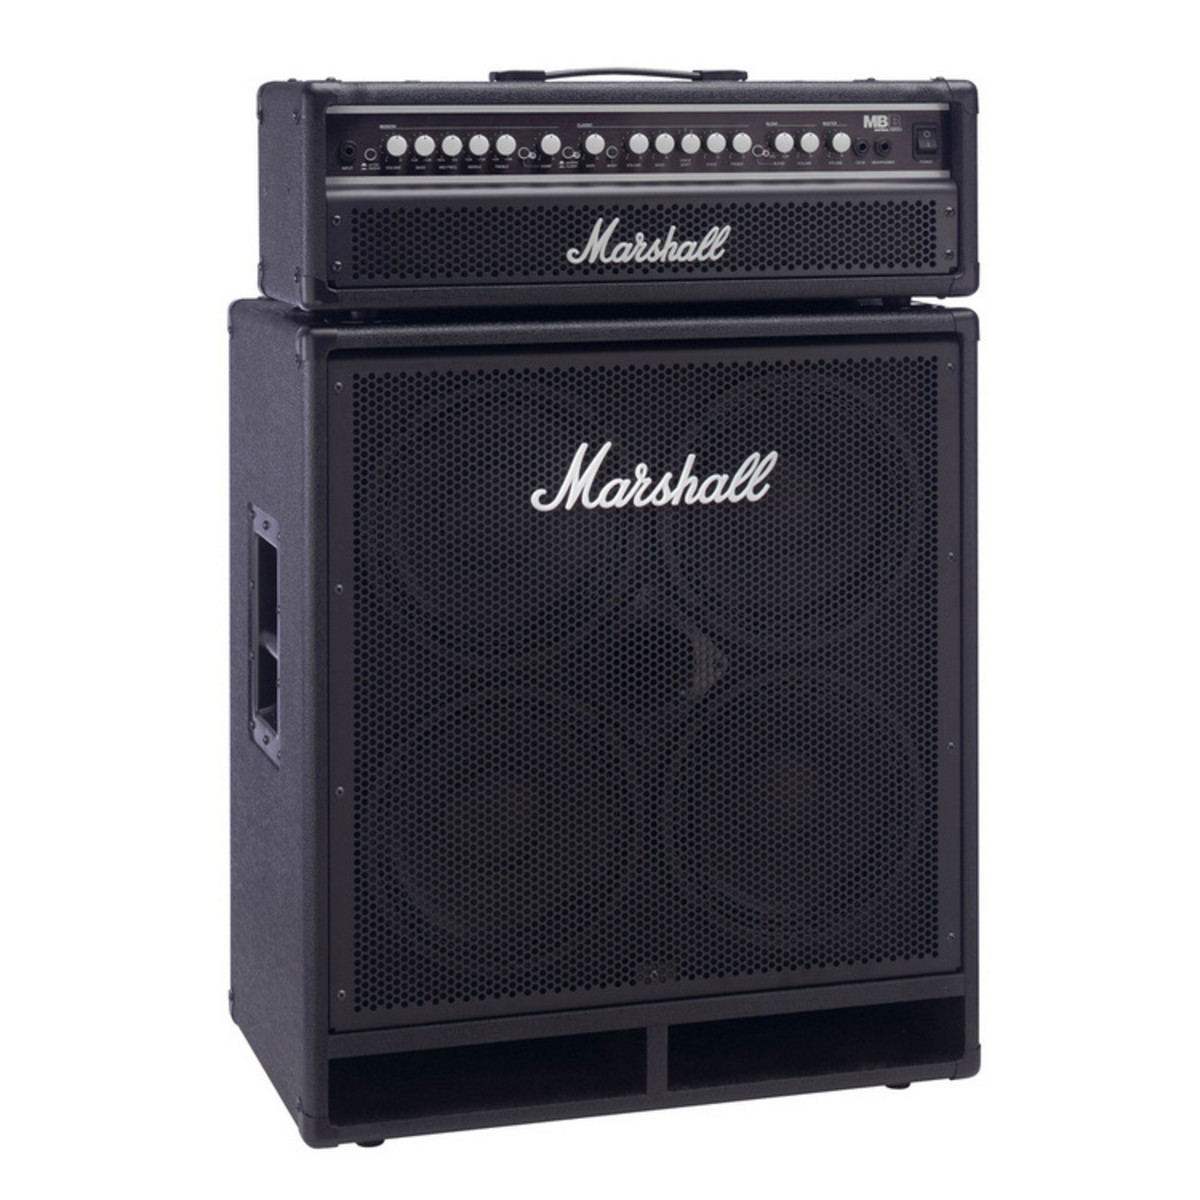 Marshall 4x10 Cabinet Marshall Mbc410 600w 4x10 Bass Speaker Cabinet At Gear4musiccom